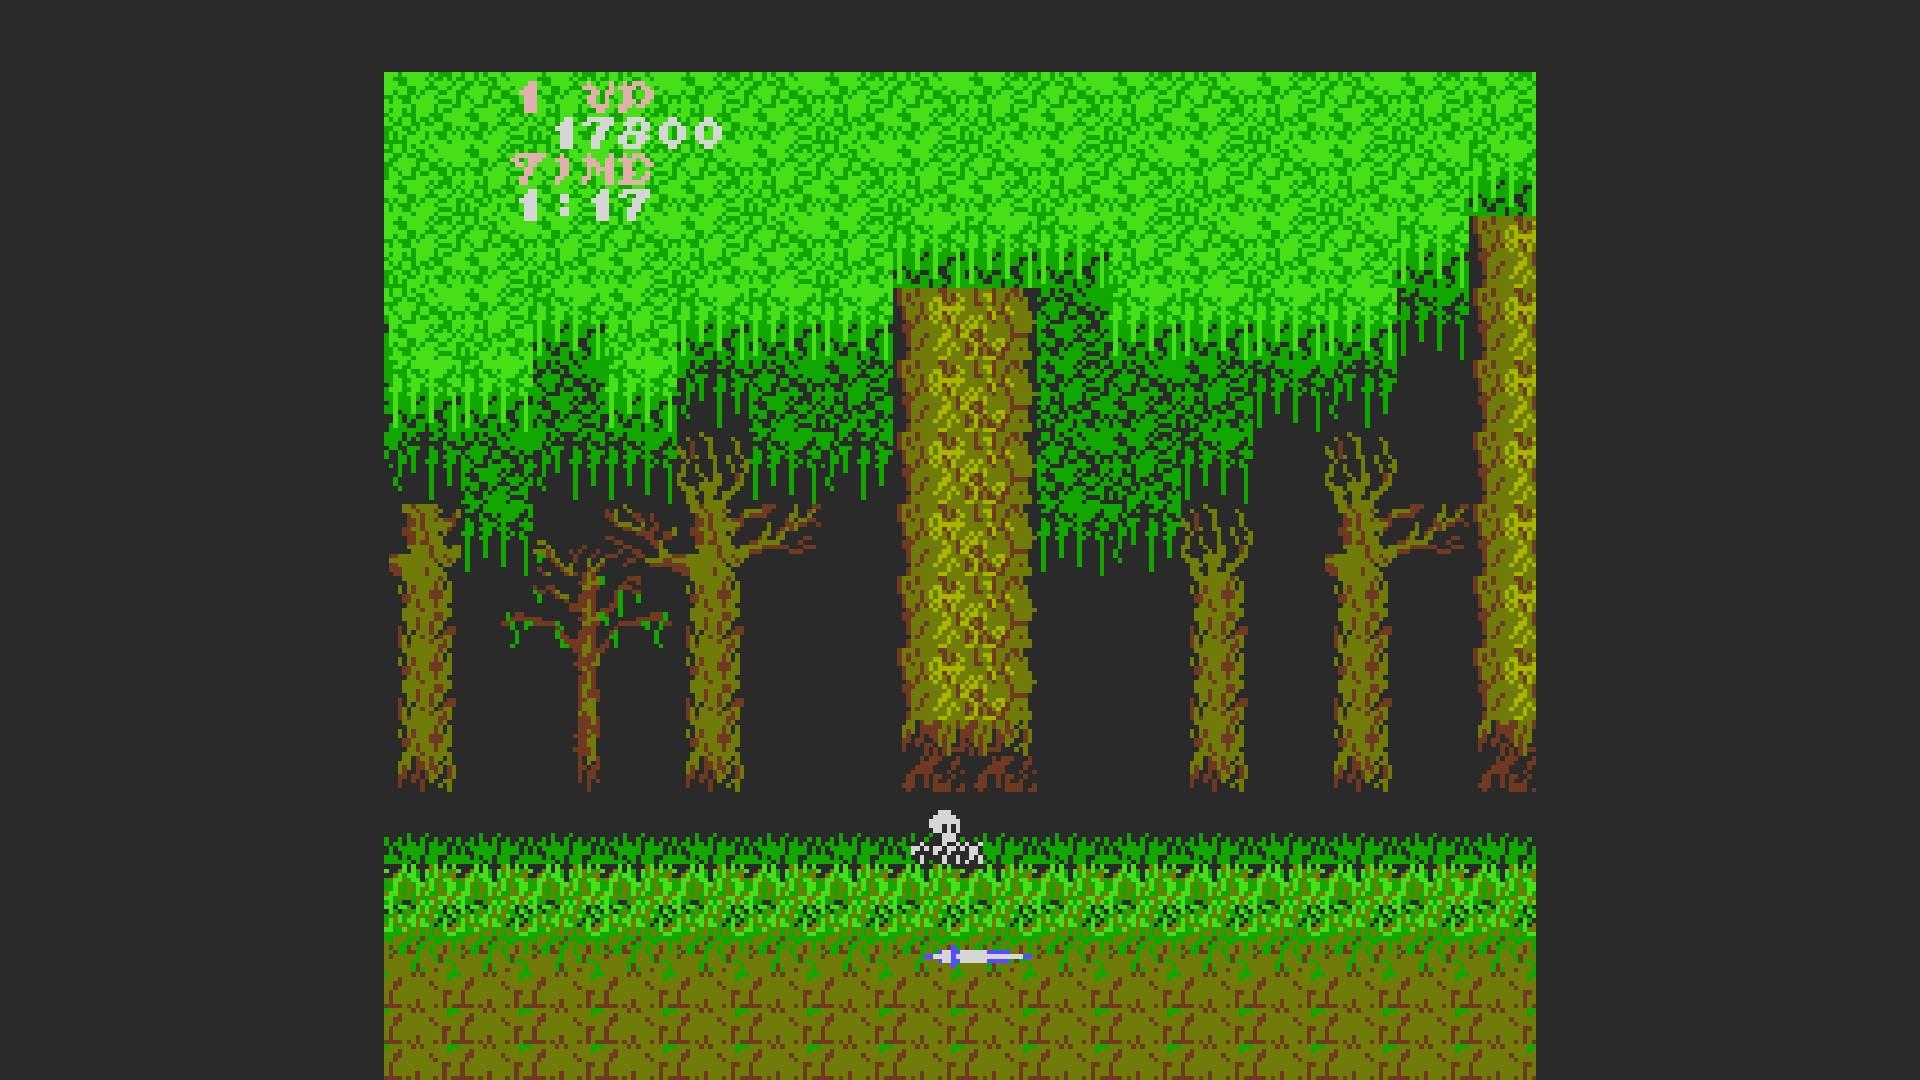 AkinNahtanoj: Ghosts N Goblins (NES/Famicom Emulated) 17,800 points on 2020-08-21 06:39:46